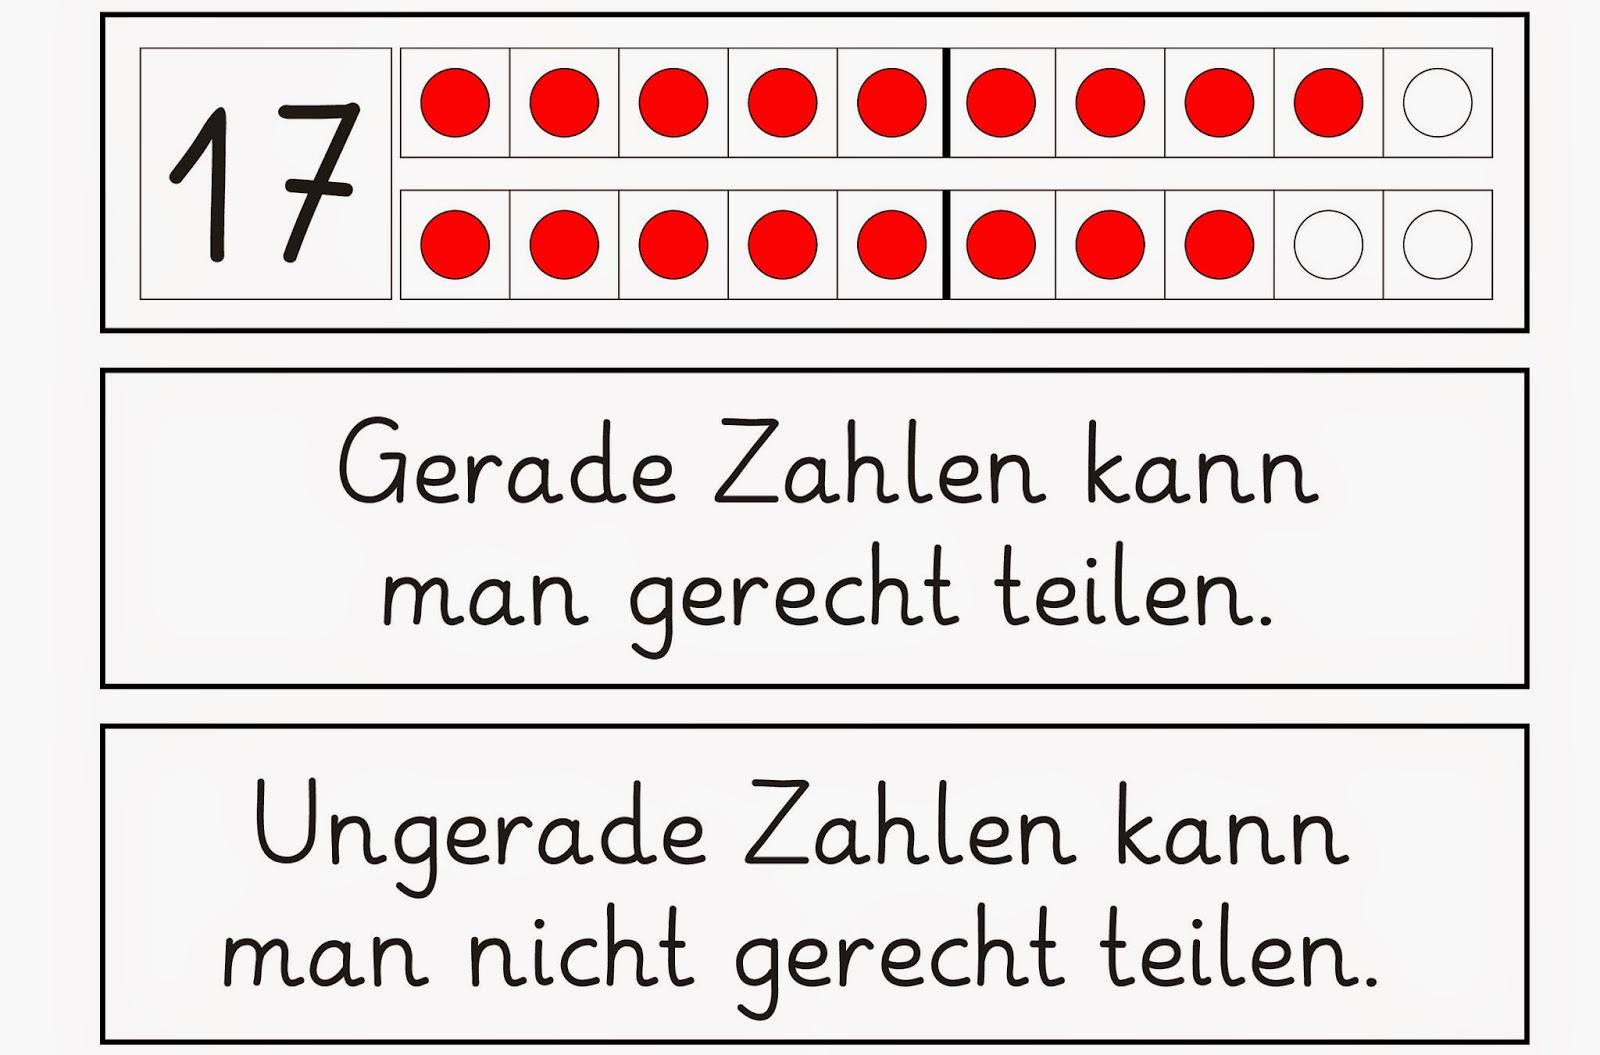 Grade Zahlen